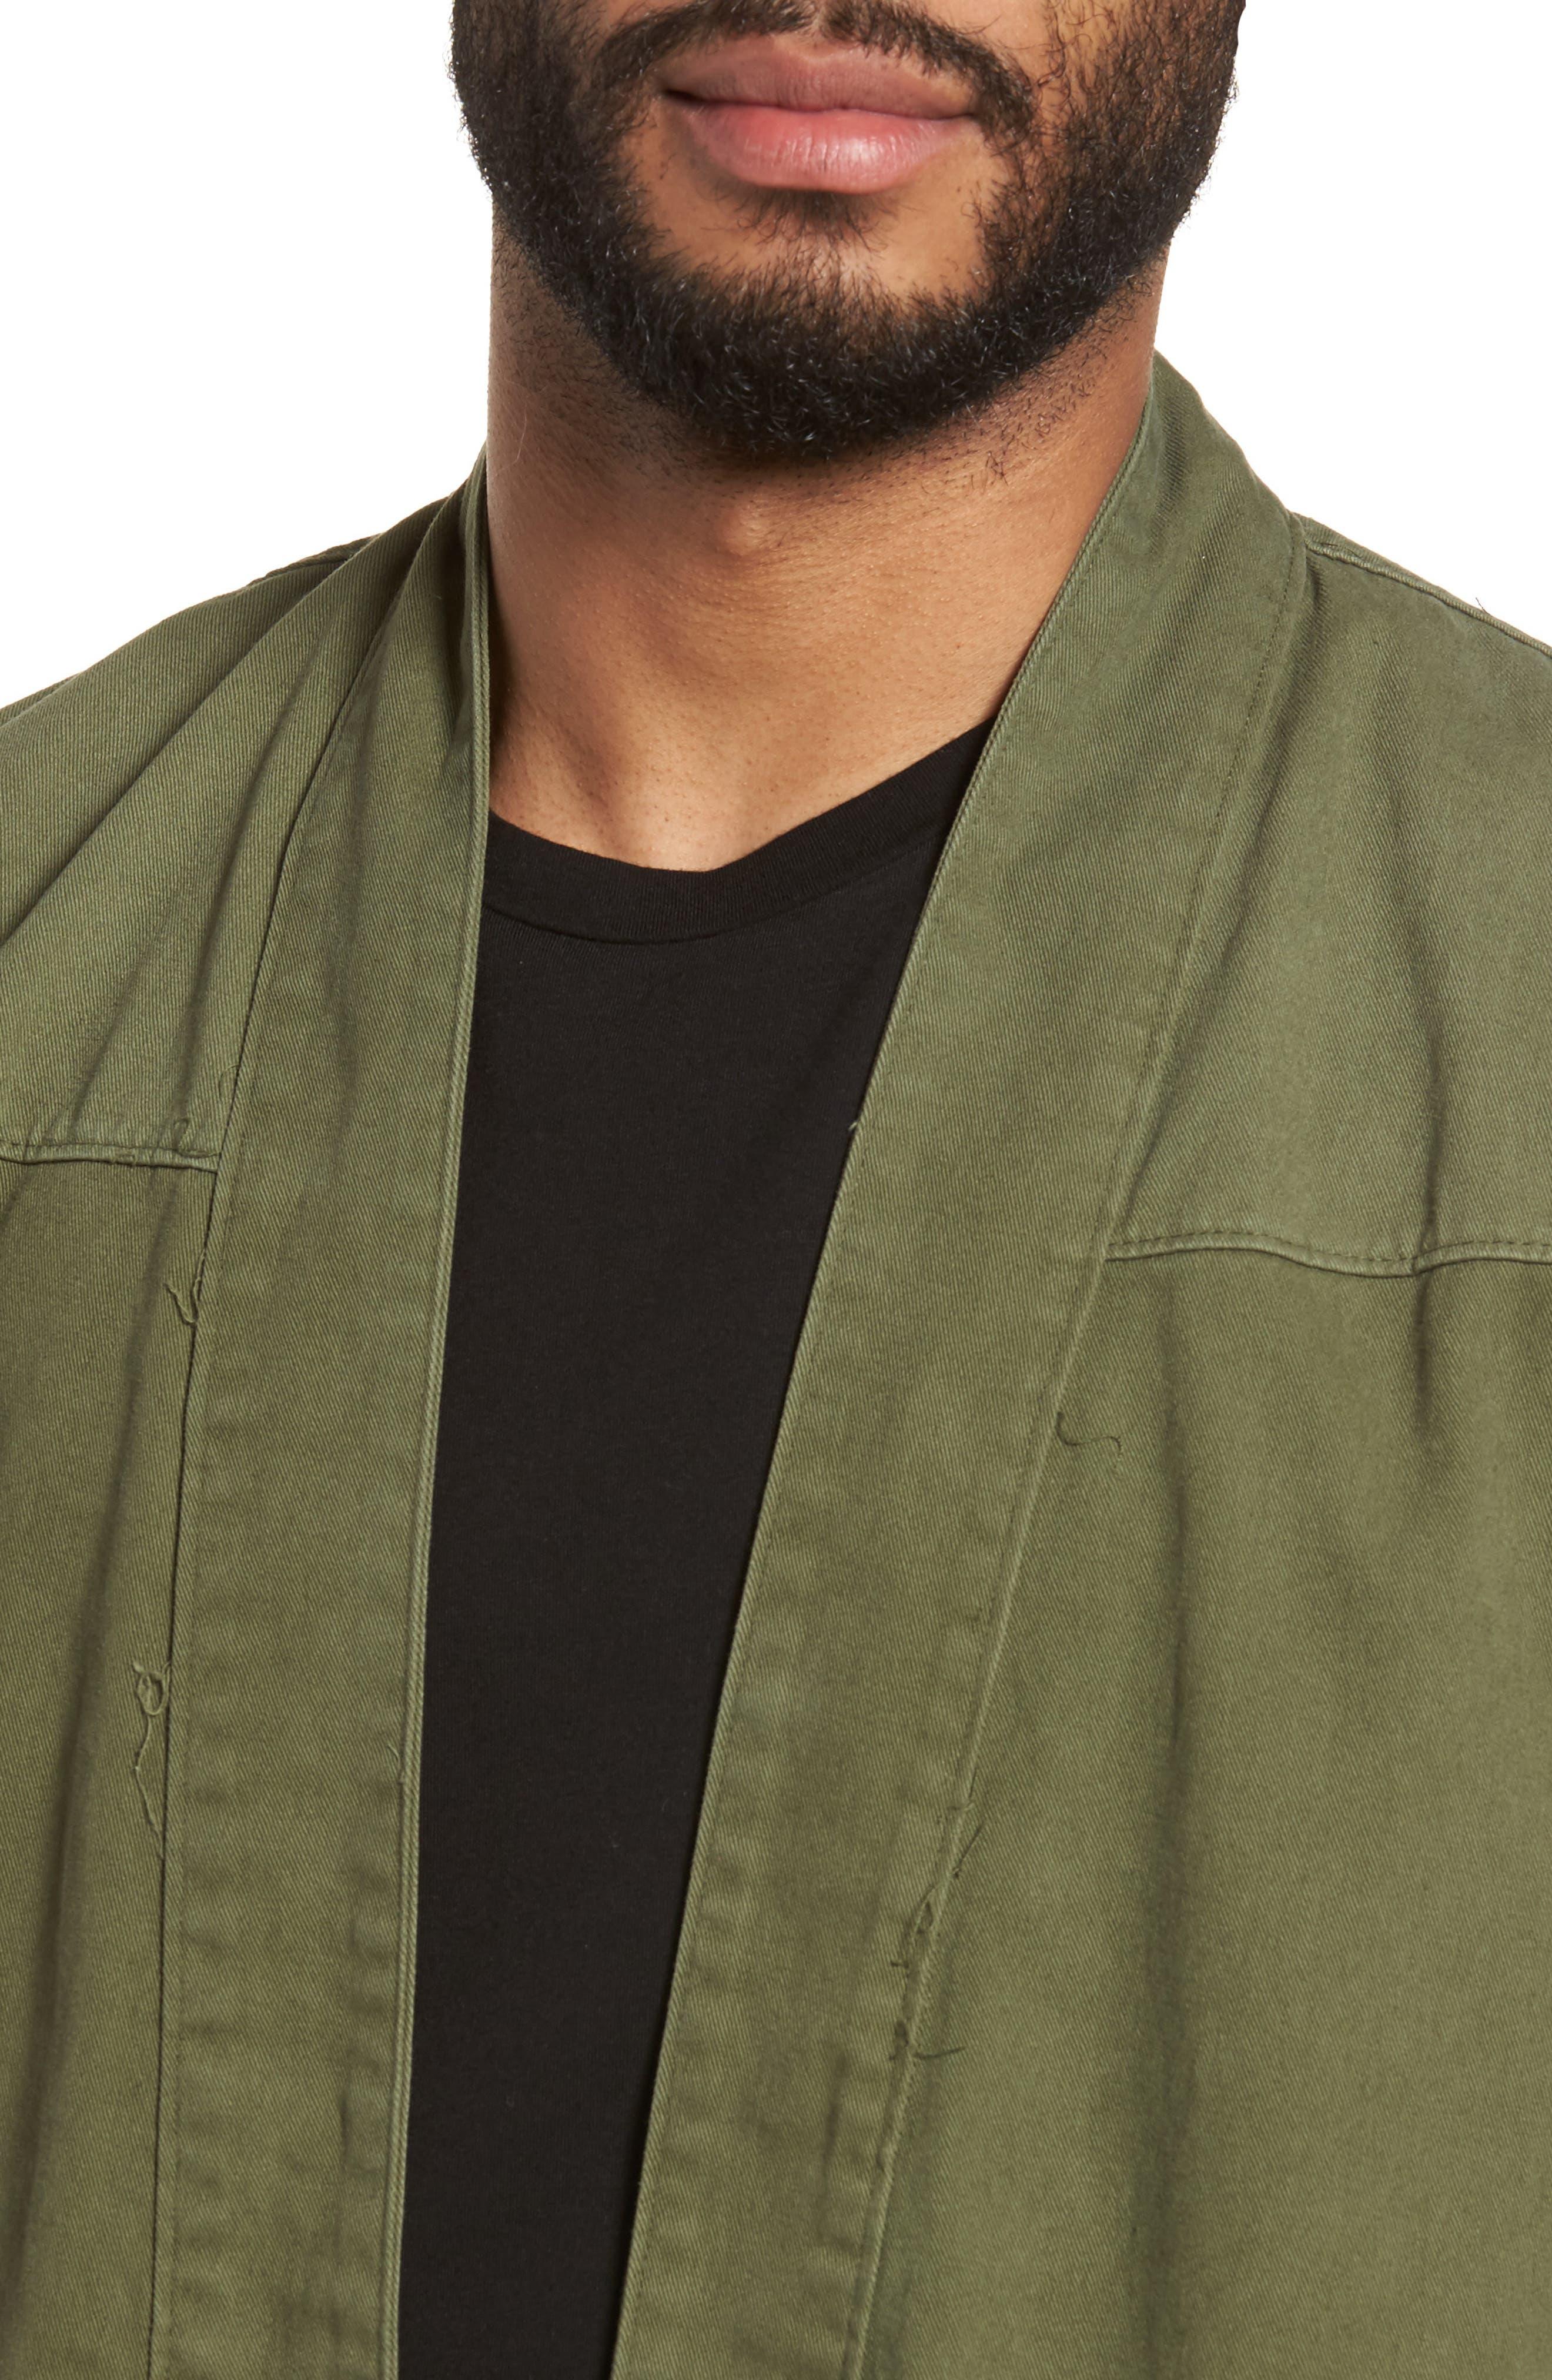 Woven Kimono Cardigan,                             Alternate thumbnail 4, color,                             Green Moss